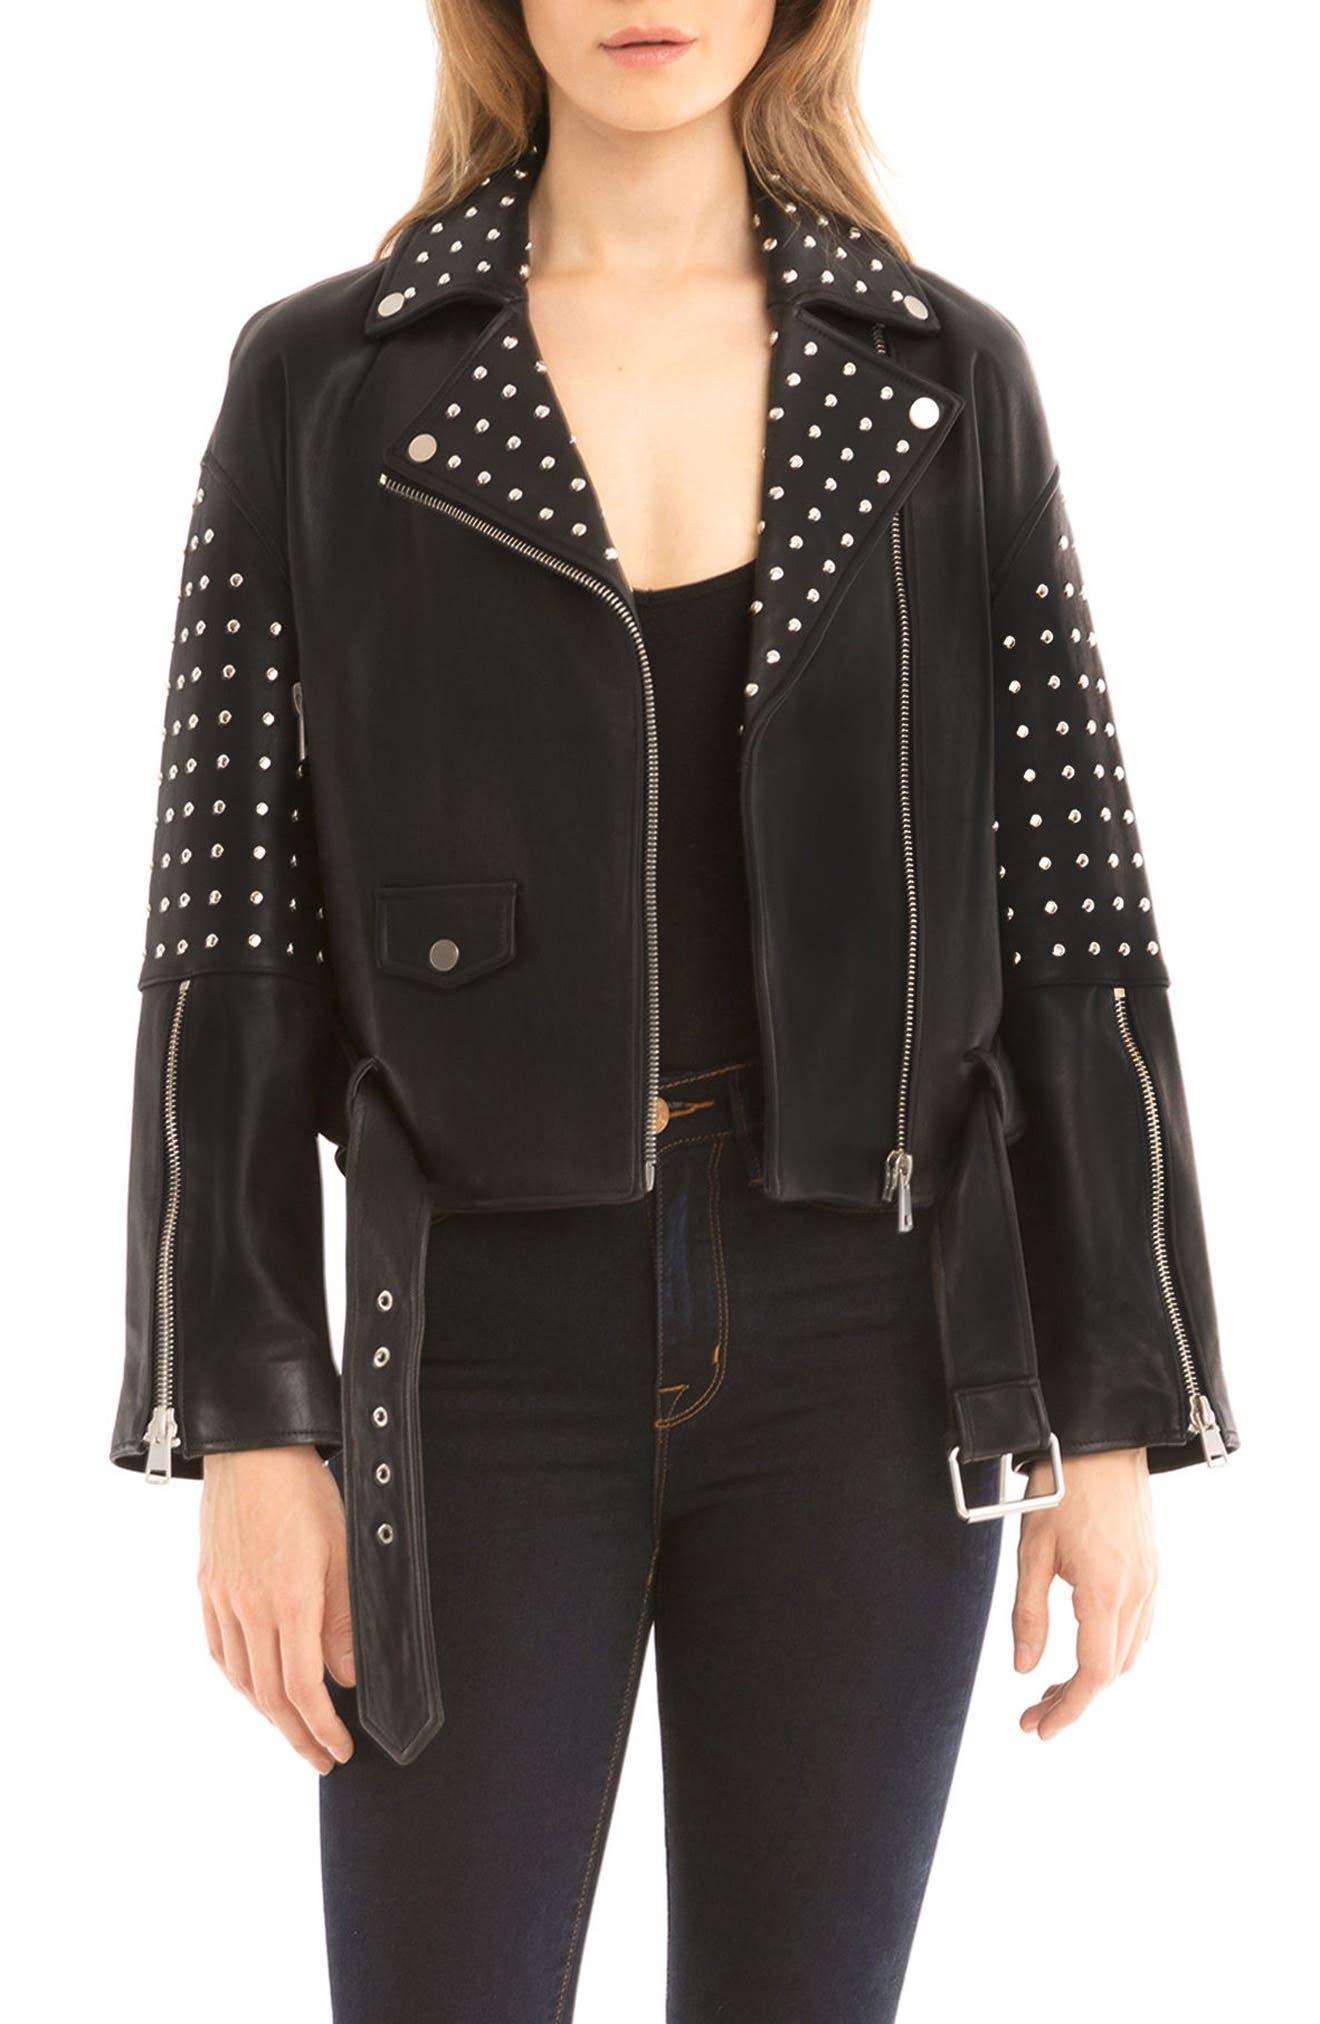 Bagatelle Studded Leather Jacket,                         Main,                         color, 001